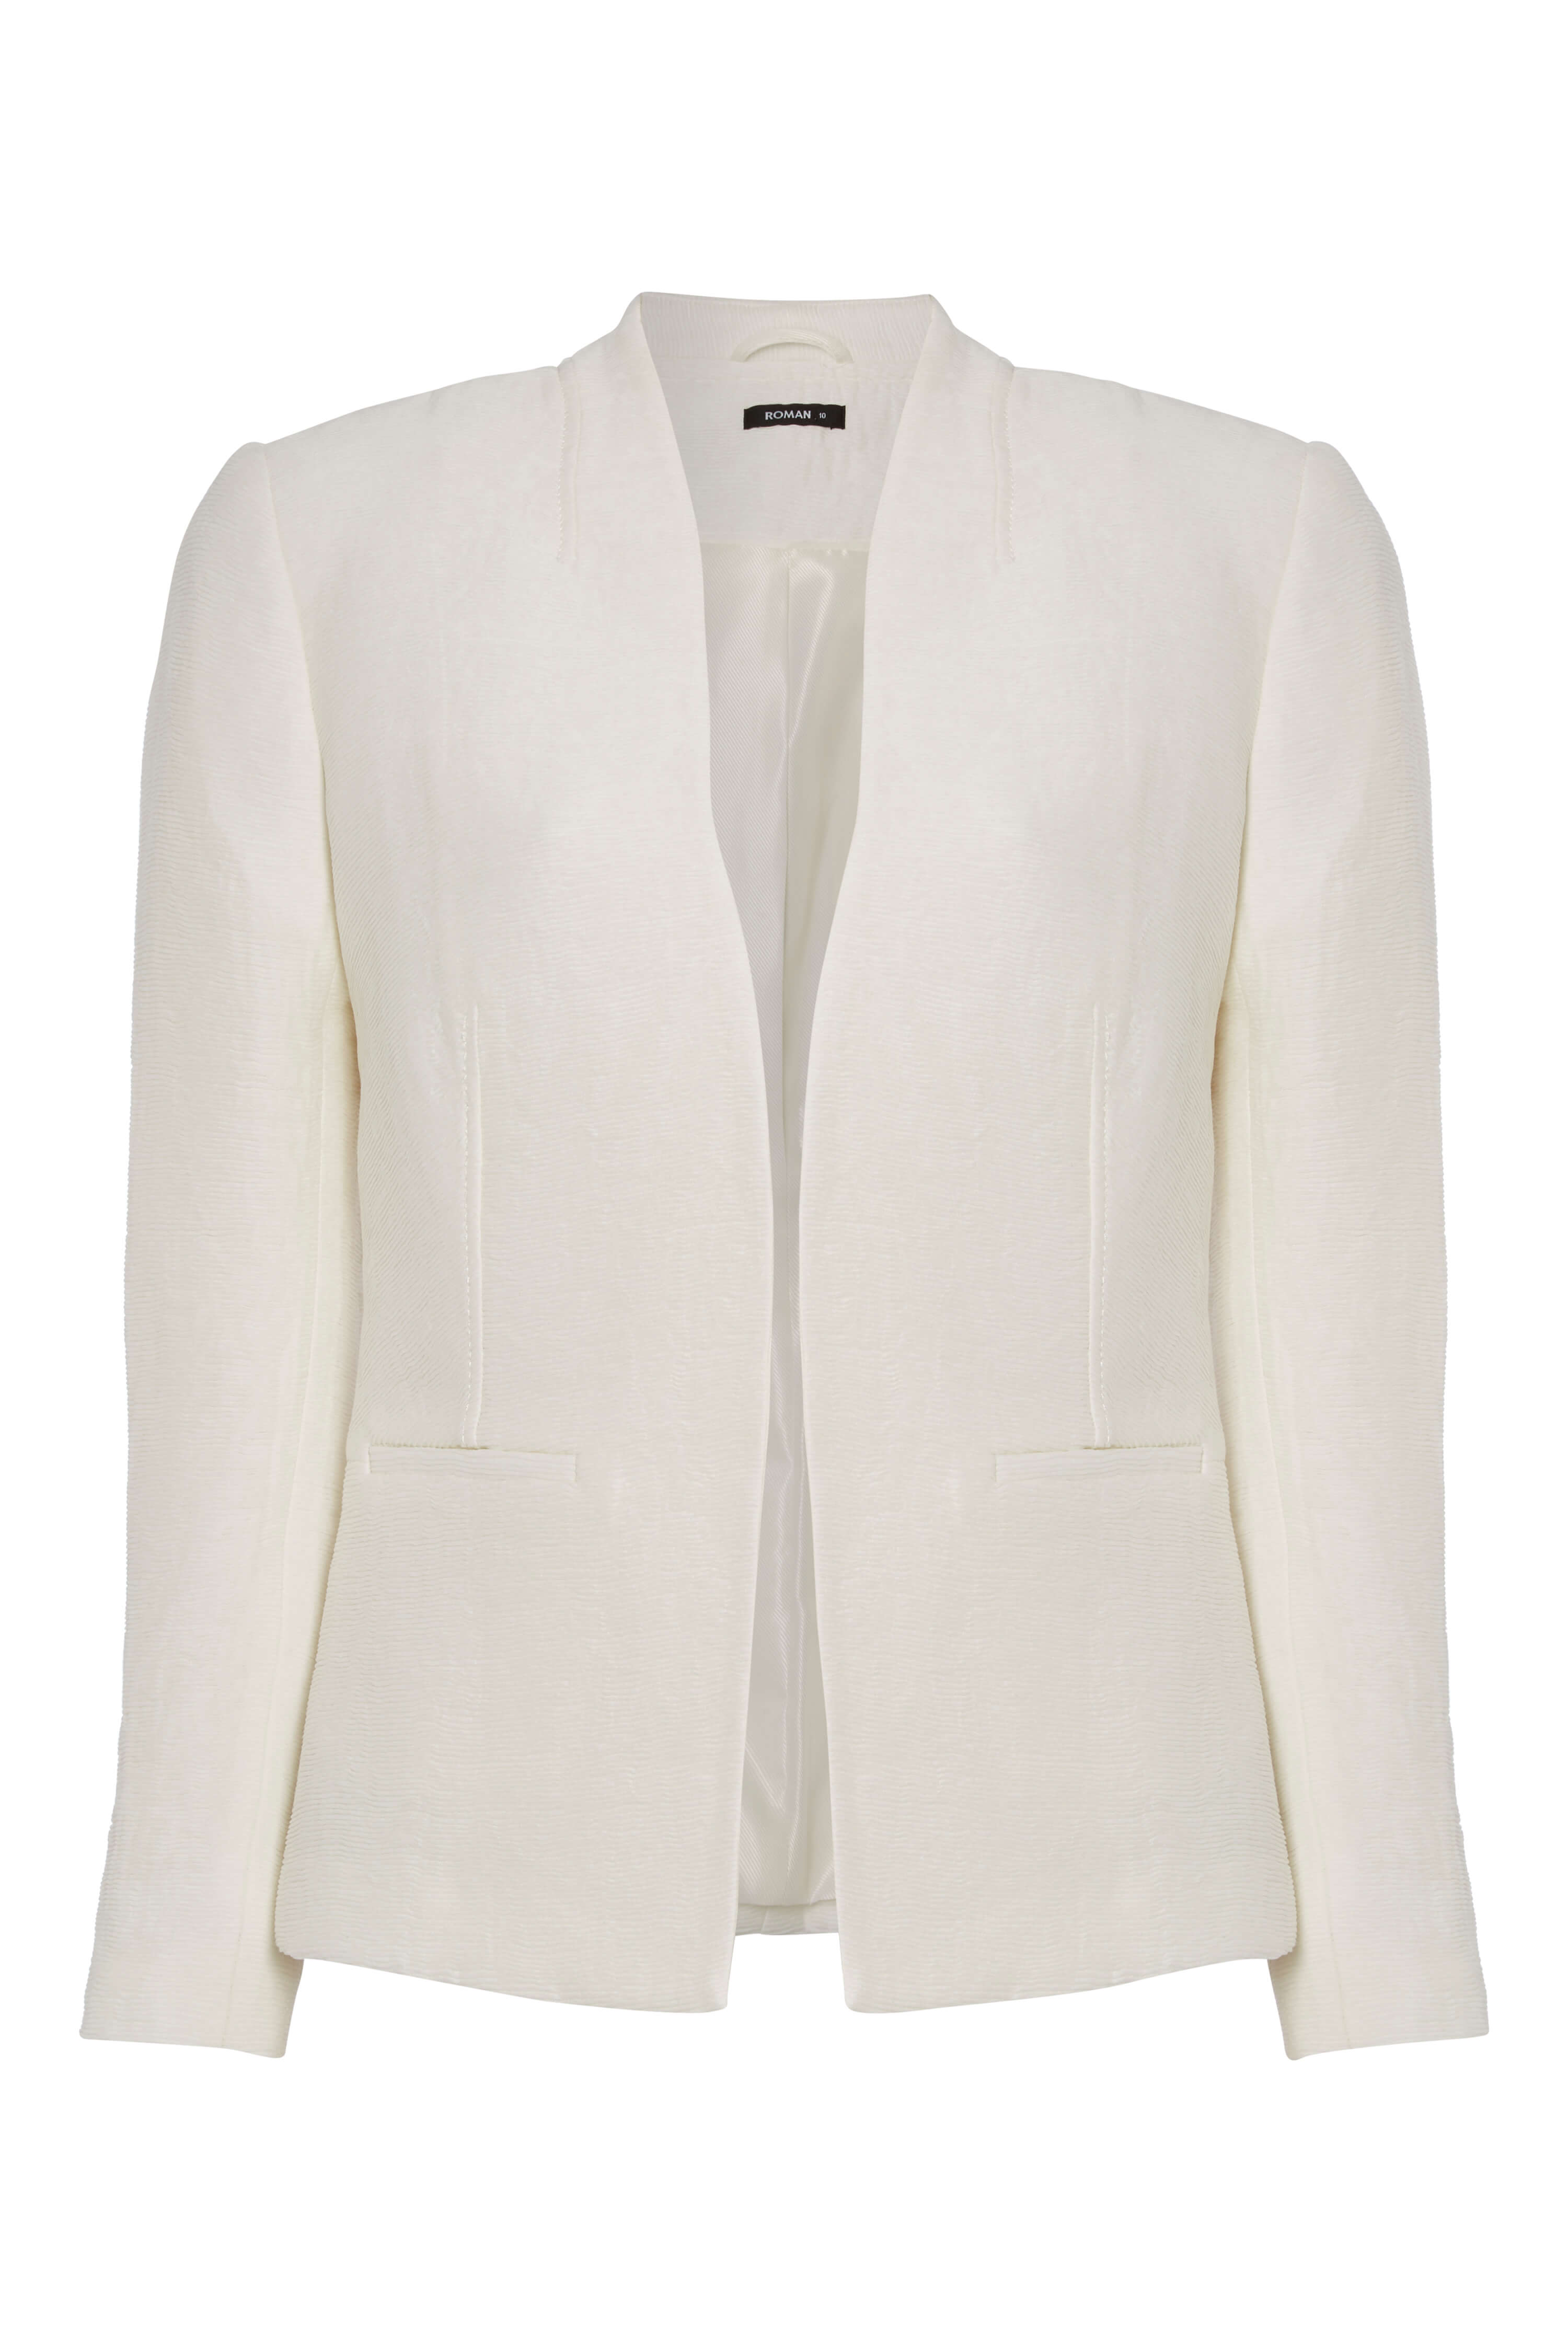 Roman-Originals-Women-039-s-White-Pleat-Tailored-Jacket-Sizes-10-20 thumbnail 19